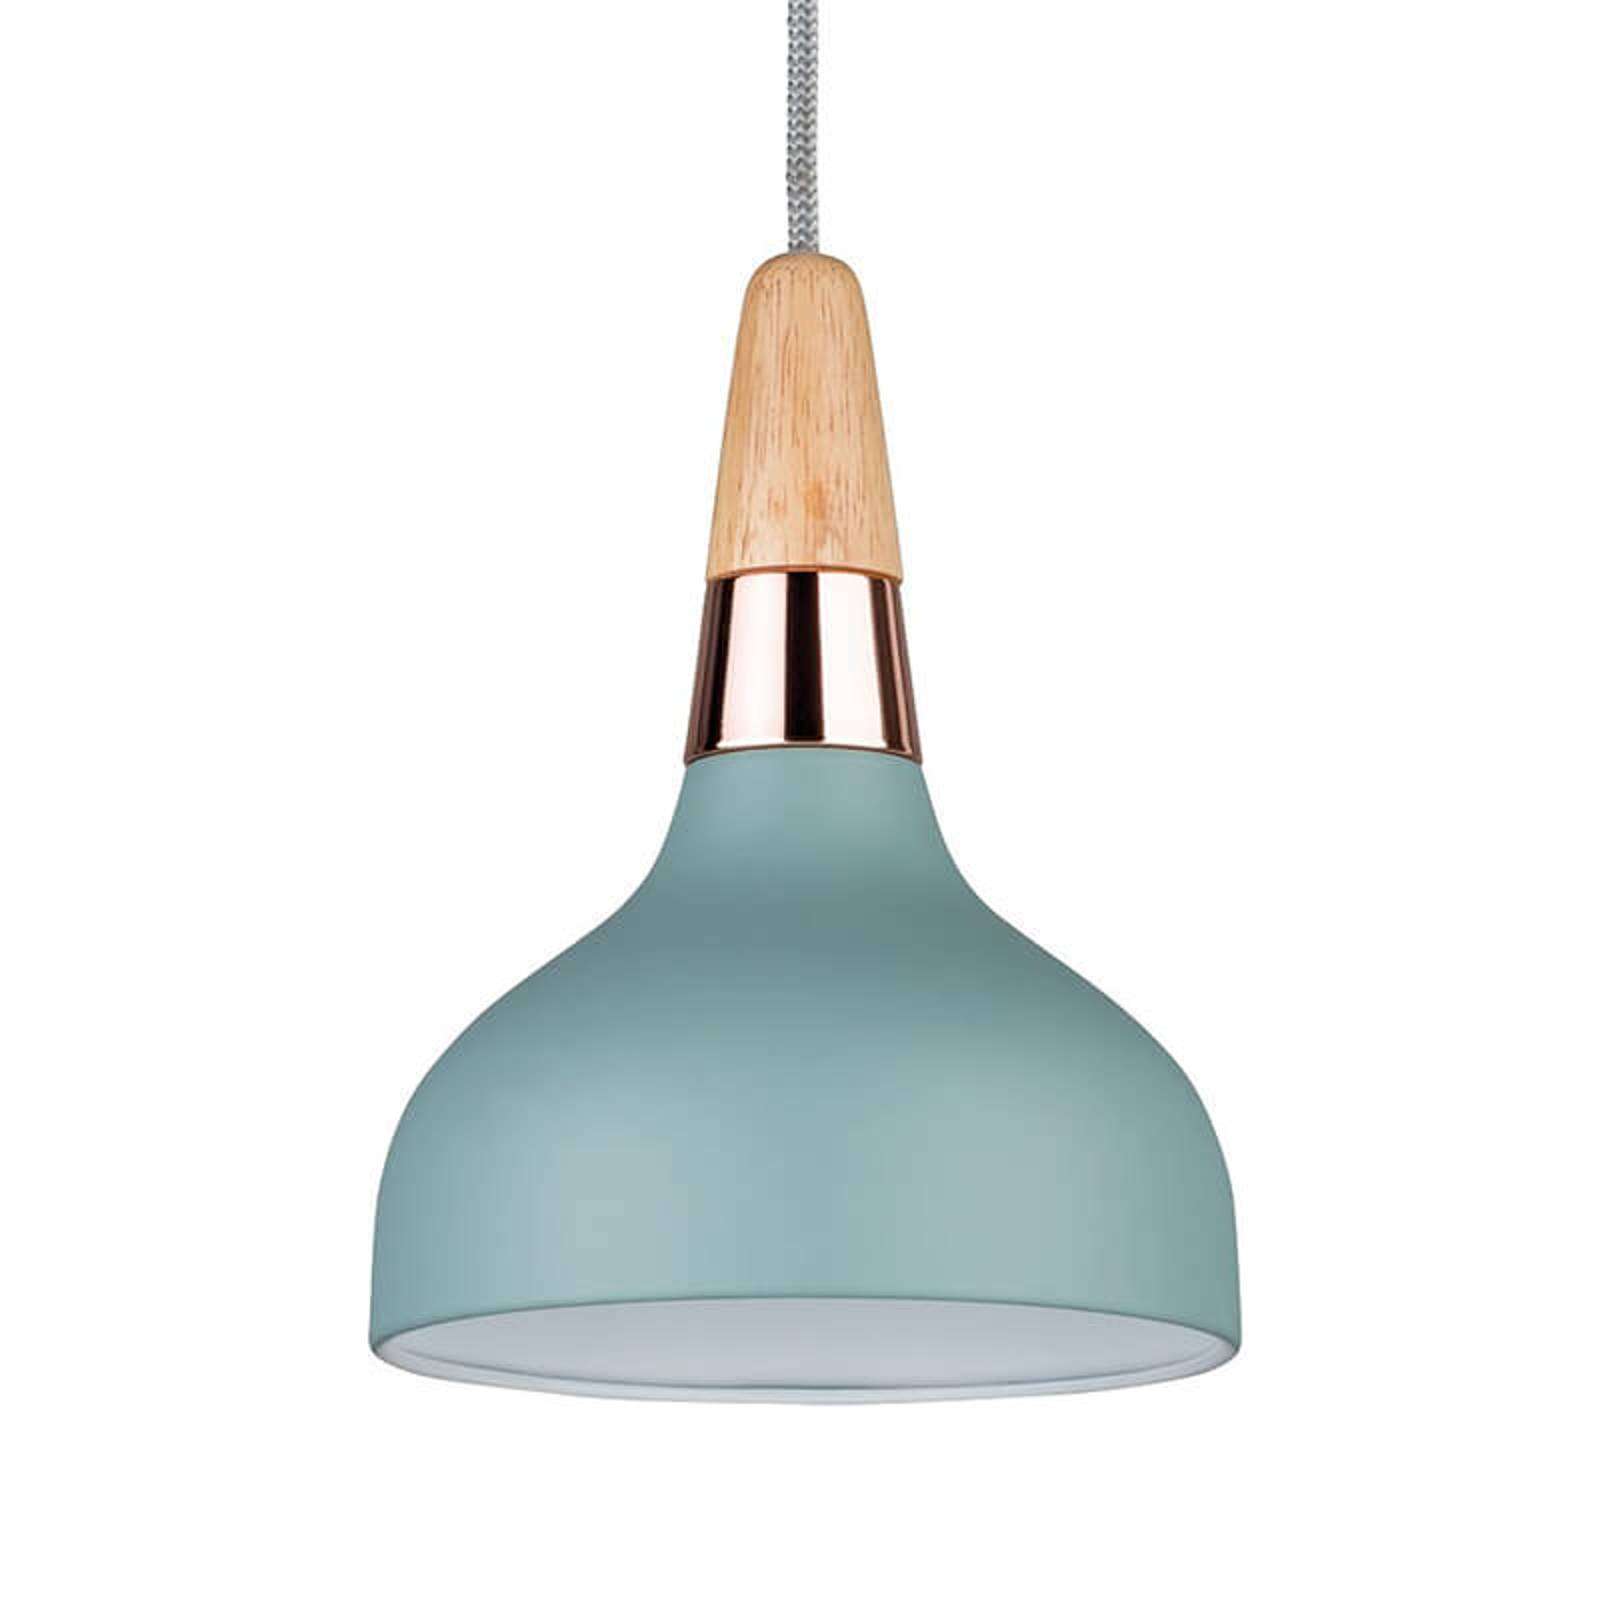 Paulmann Juna hanglamp, 1-lamps, Ø 16 cm